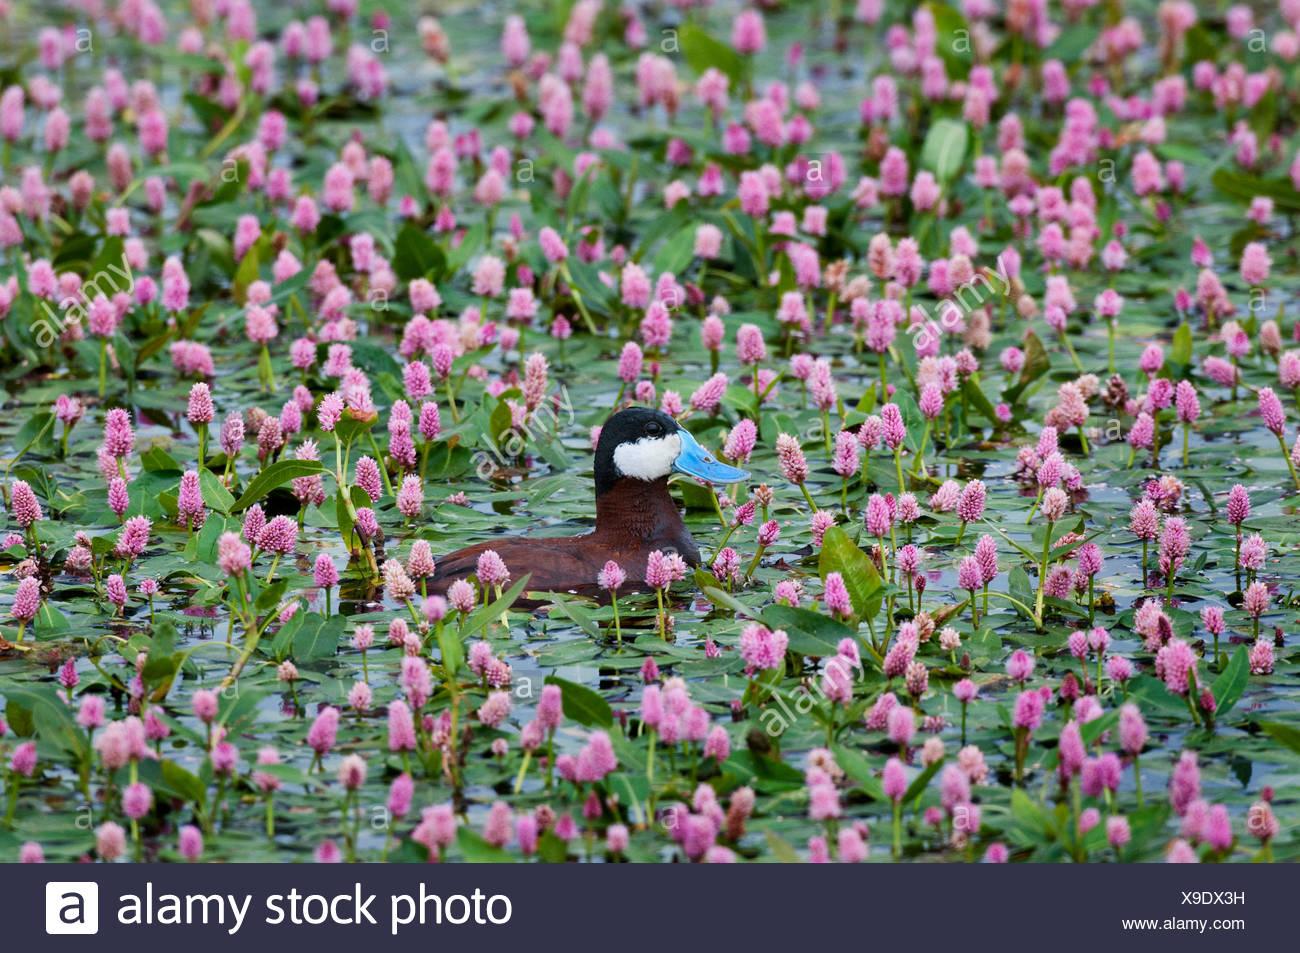 Ruddy duck (Oxyura jamaicensis), male among water smartweed (Polygonum amphibium), near Walden, Colorado. - Stock Image